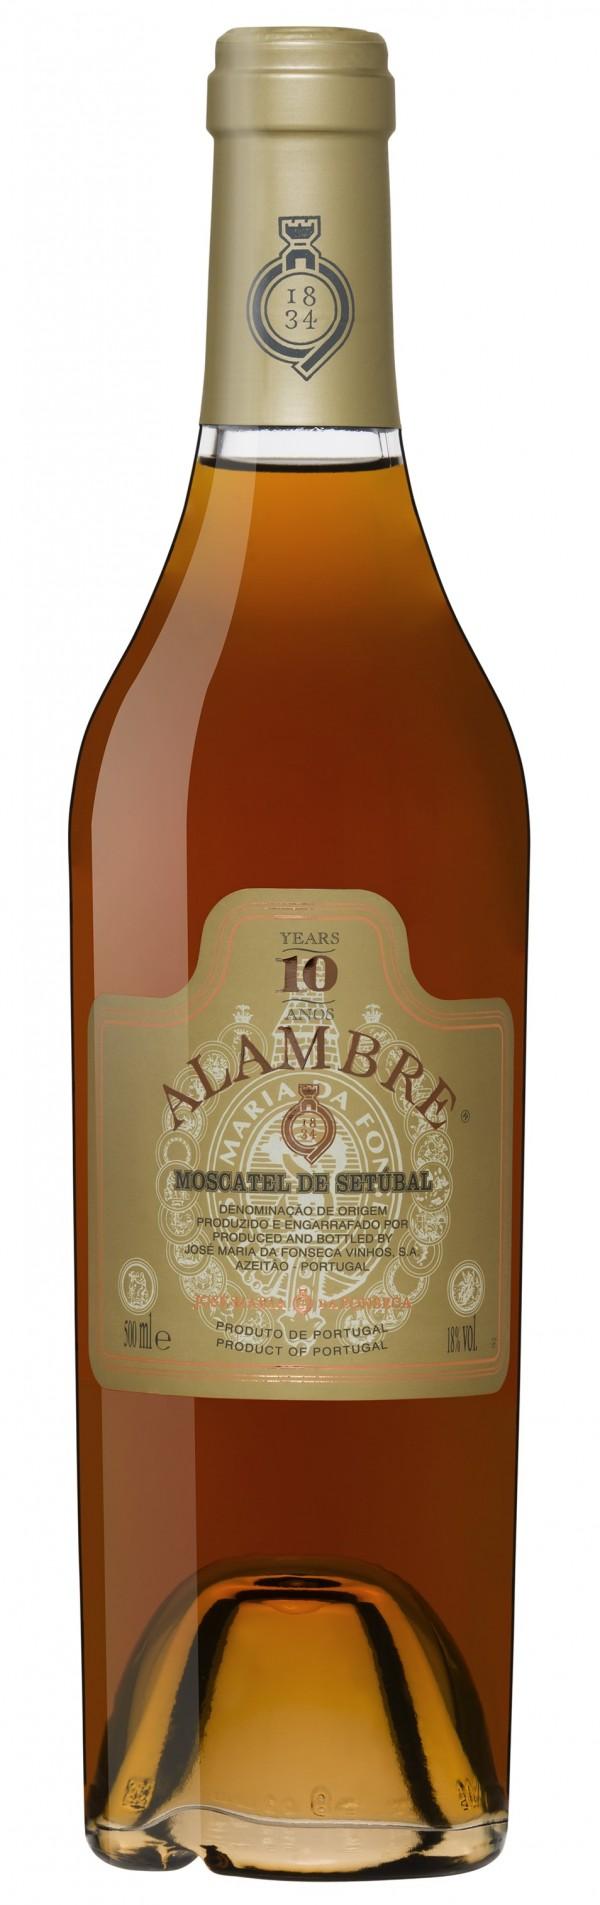 Alambre 10 years b